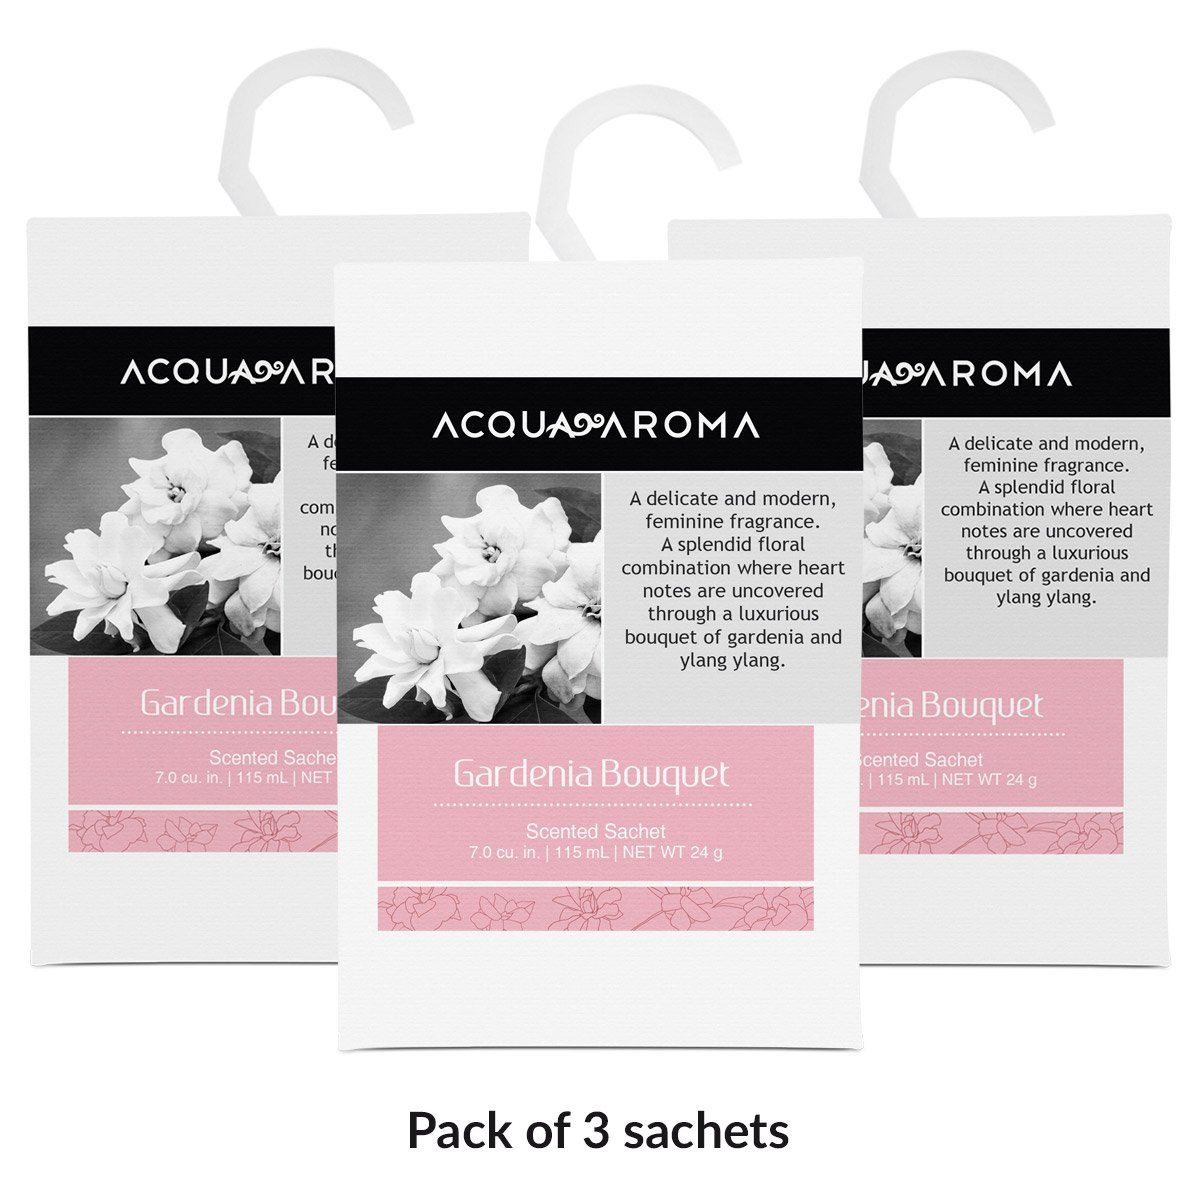 Acqua Aroma Gardenia Bouquet Scented Sachet 7.0 cu. in. (115mL/24g) - Pack of 3 Sachets B01MAWREHV